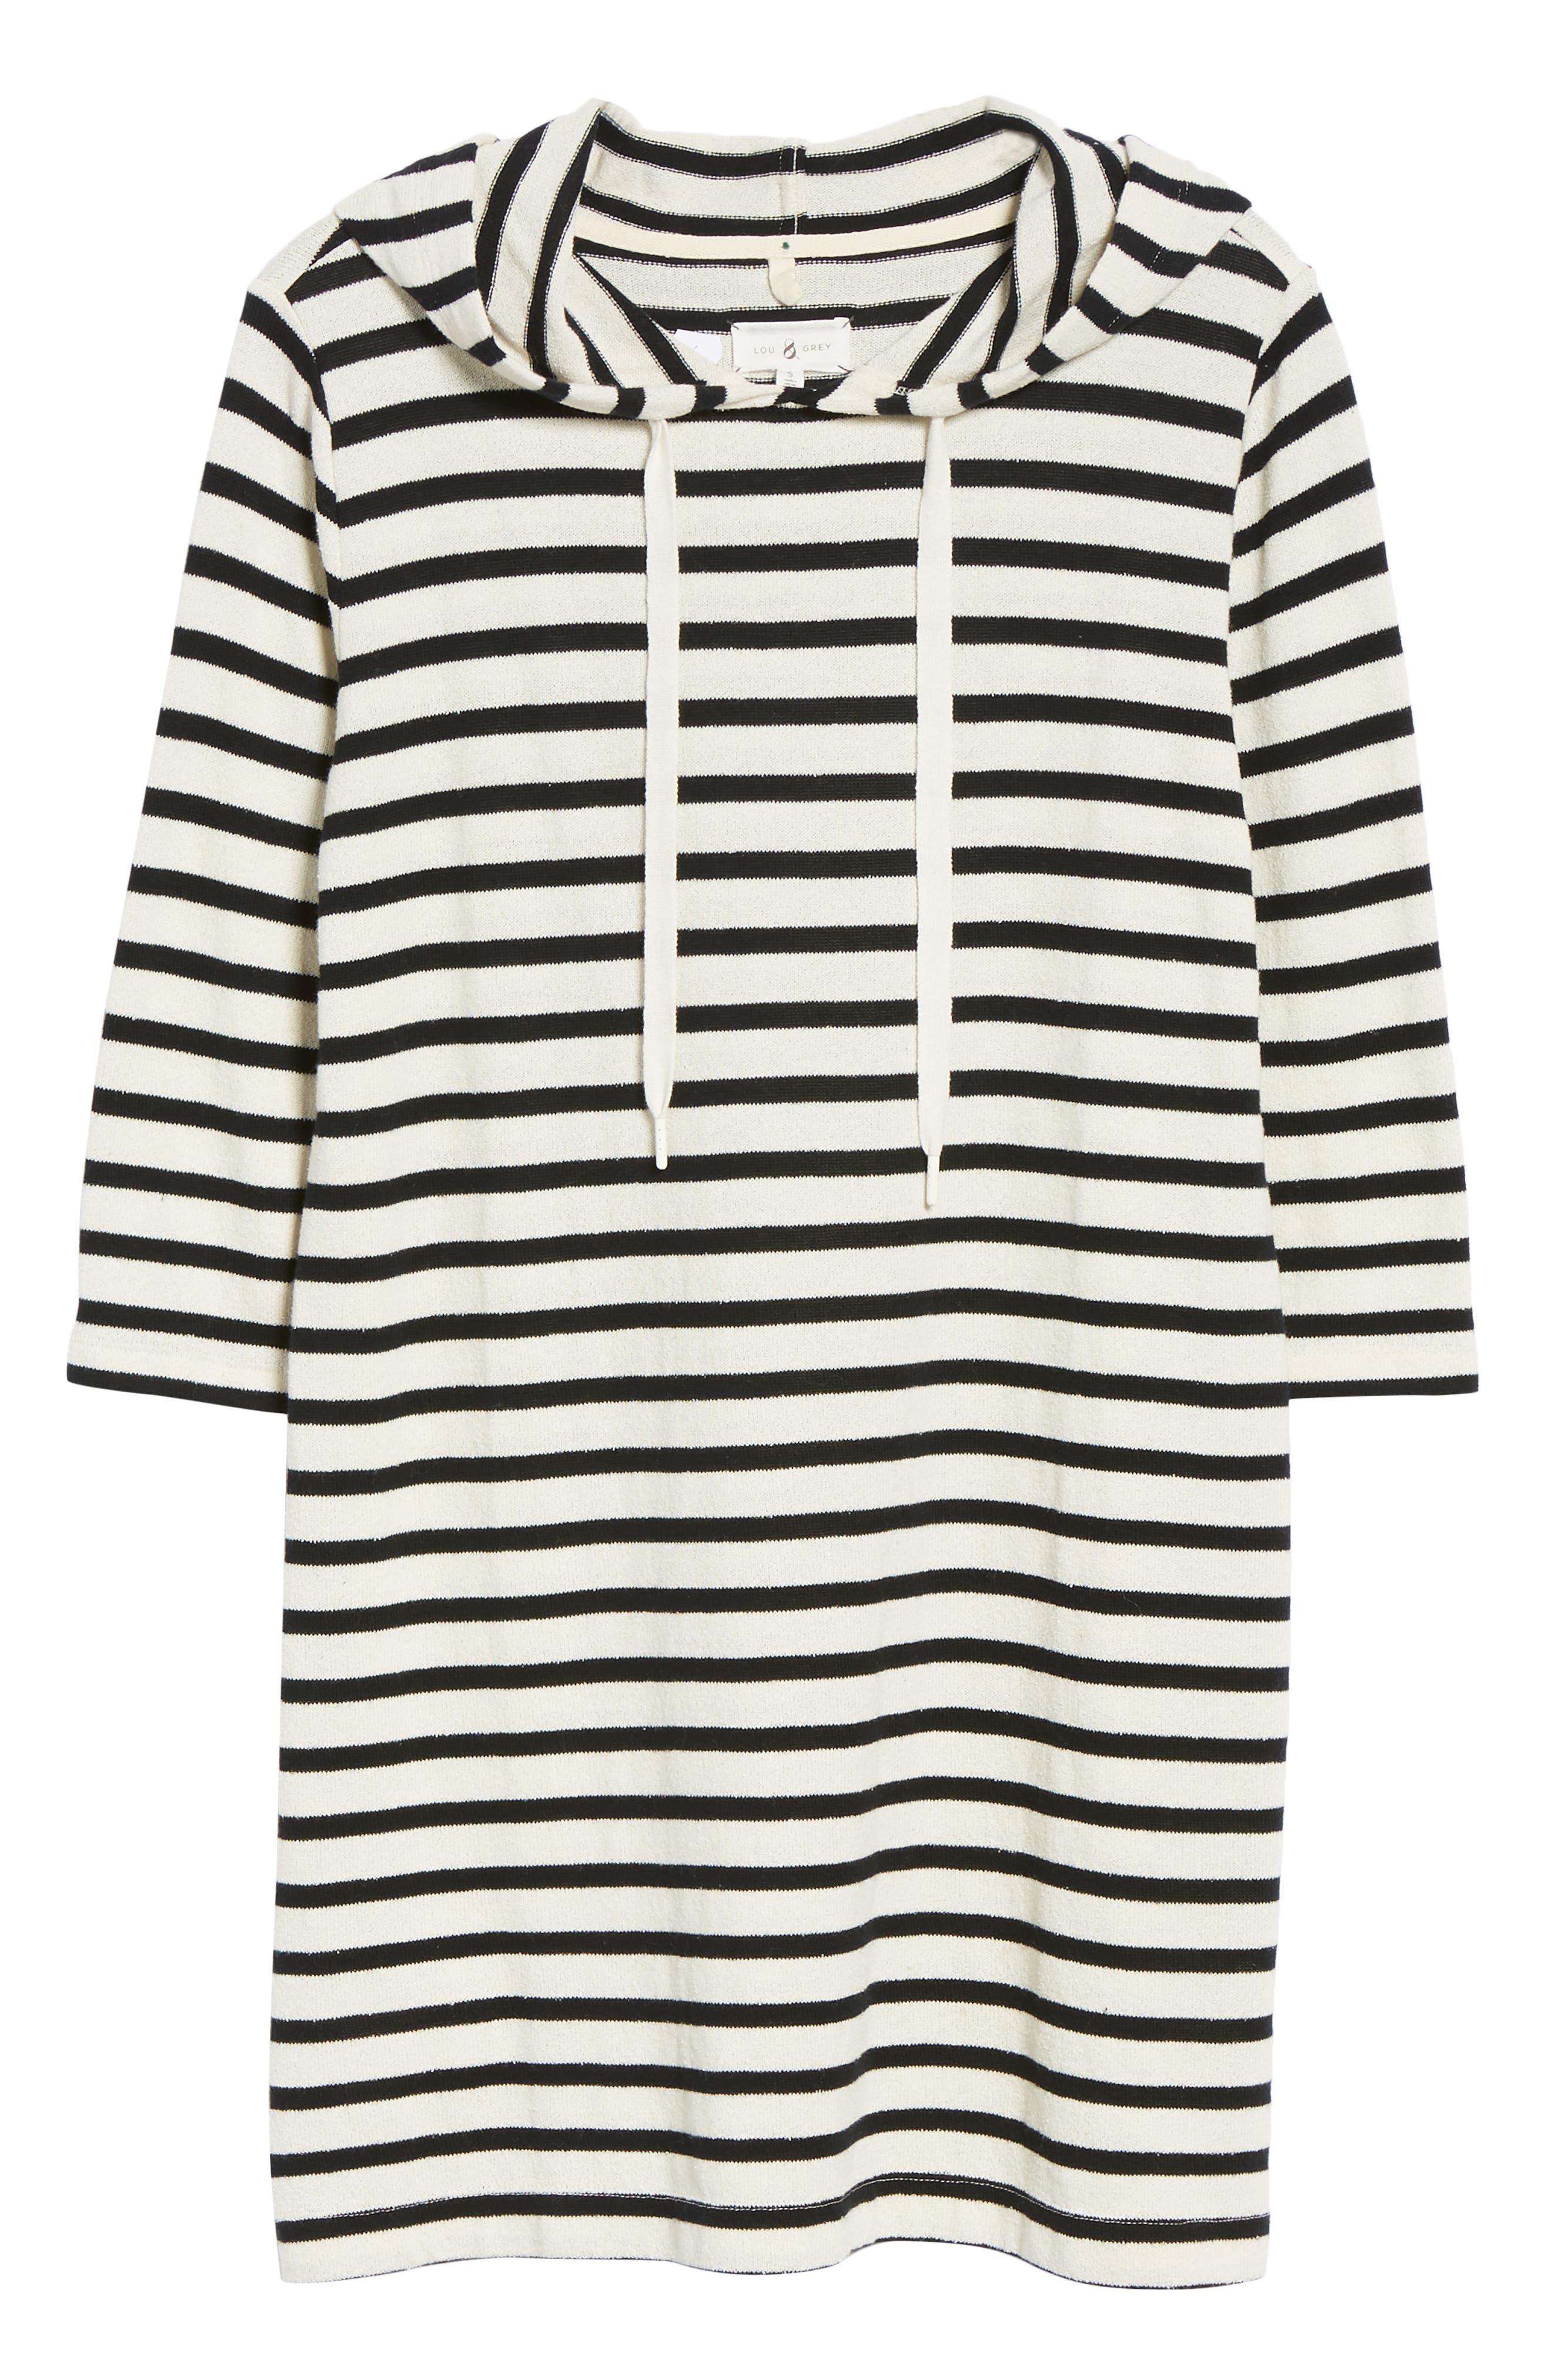 Striped Hoodie Dress,                             Alternate thumbnail 8, color,                             BLACK/ WHITE